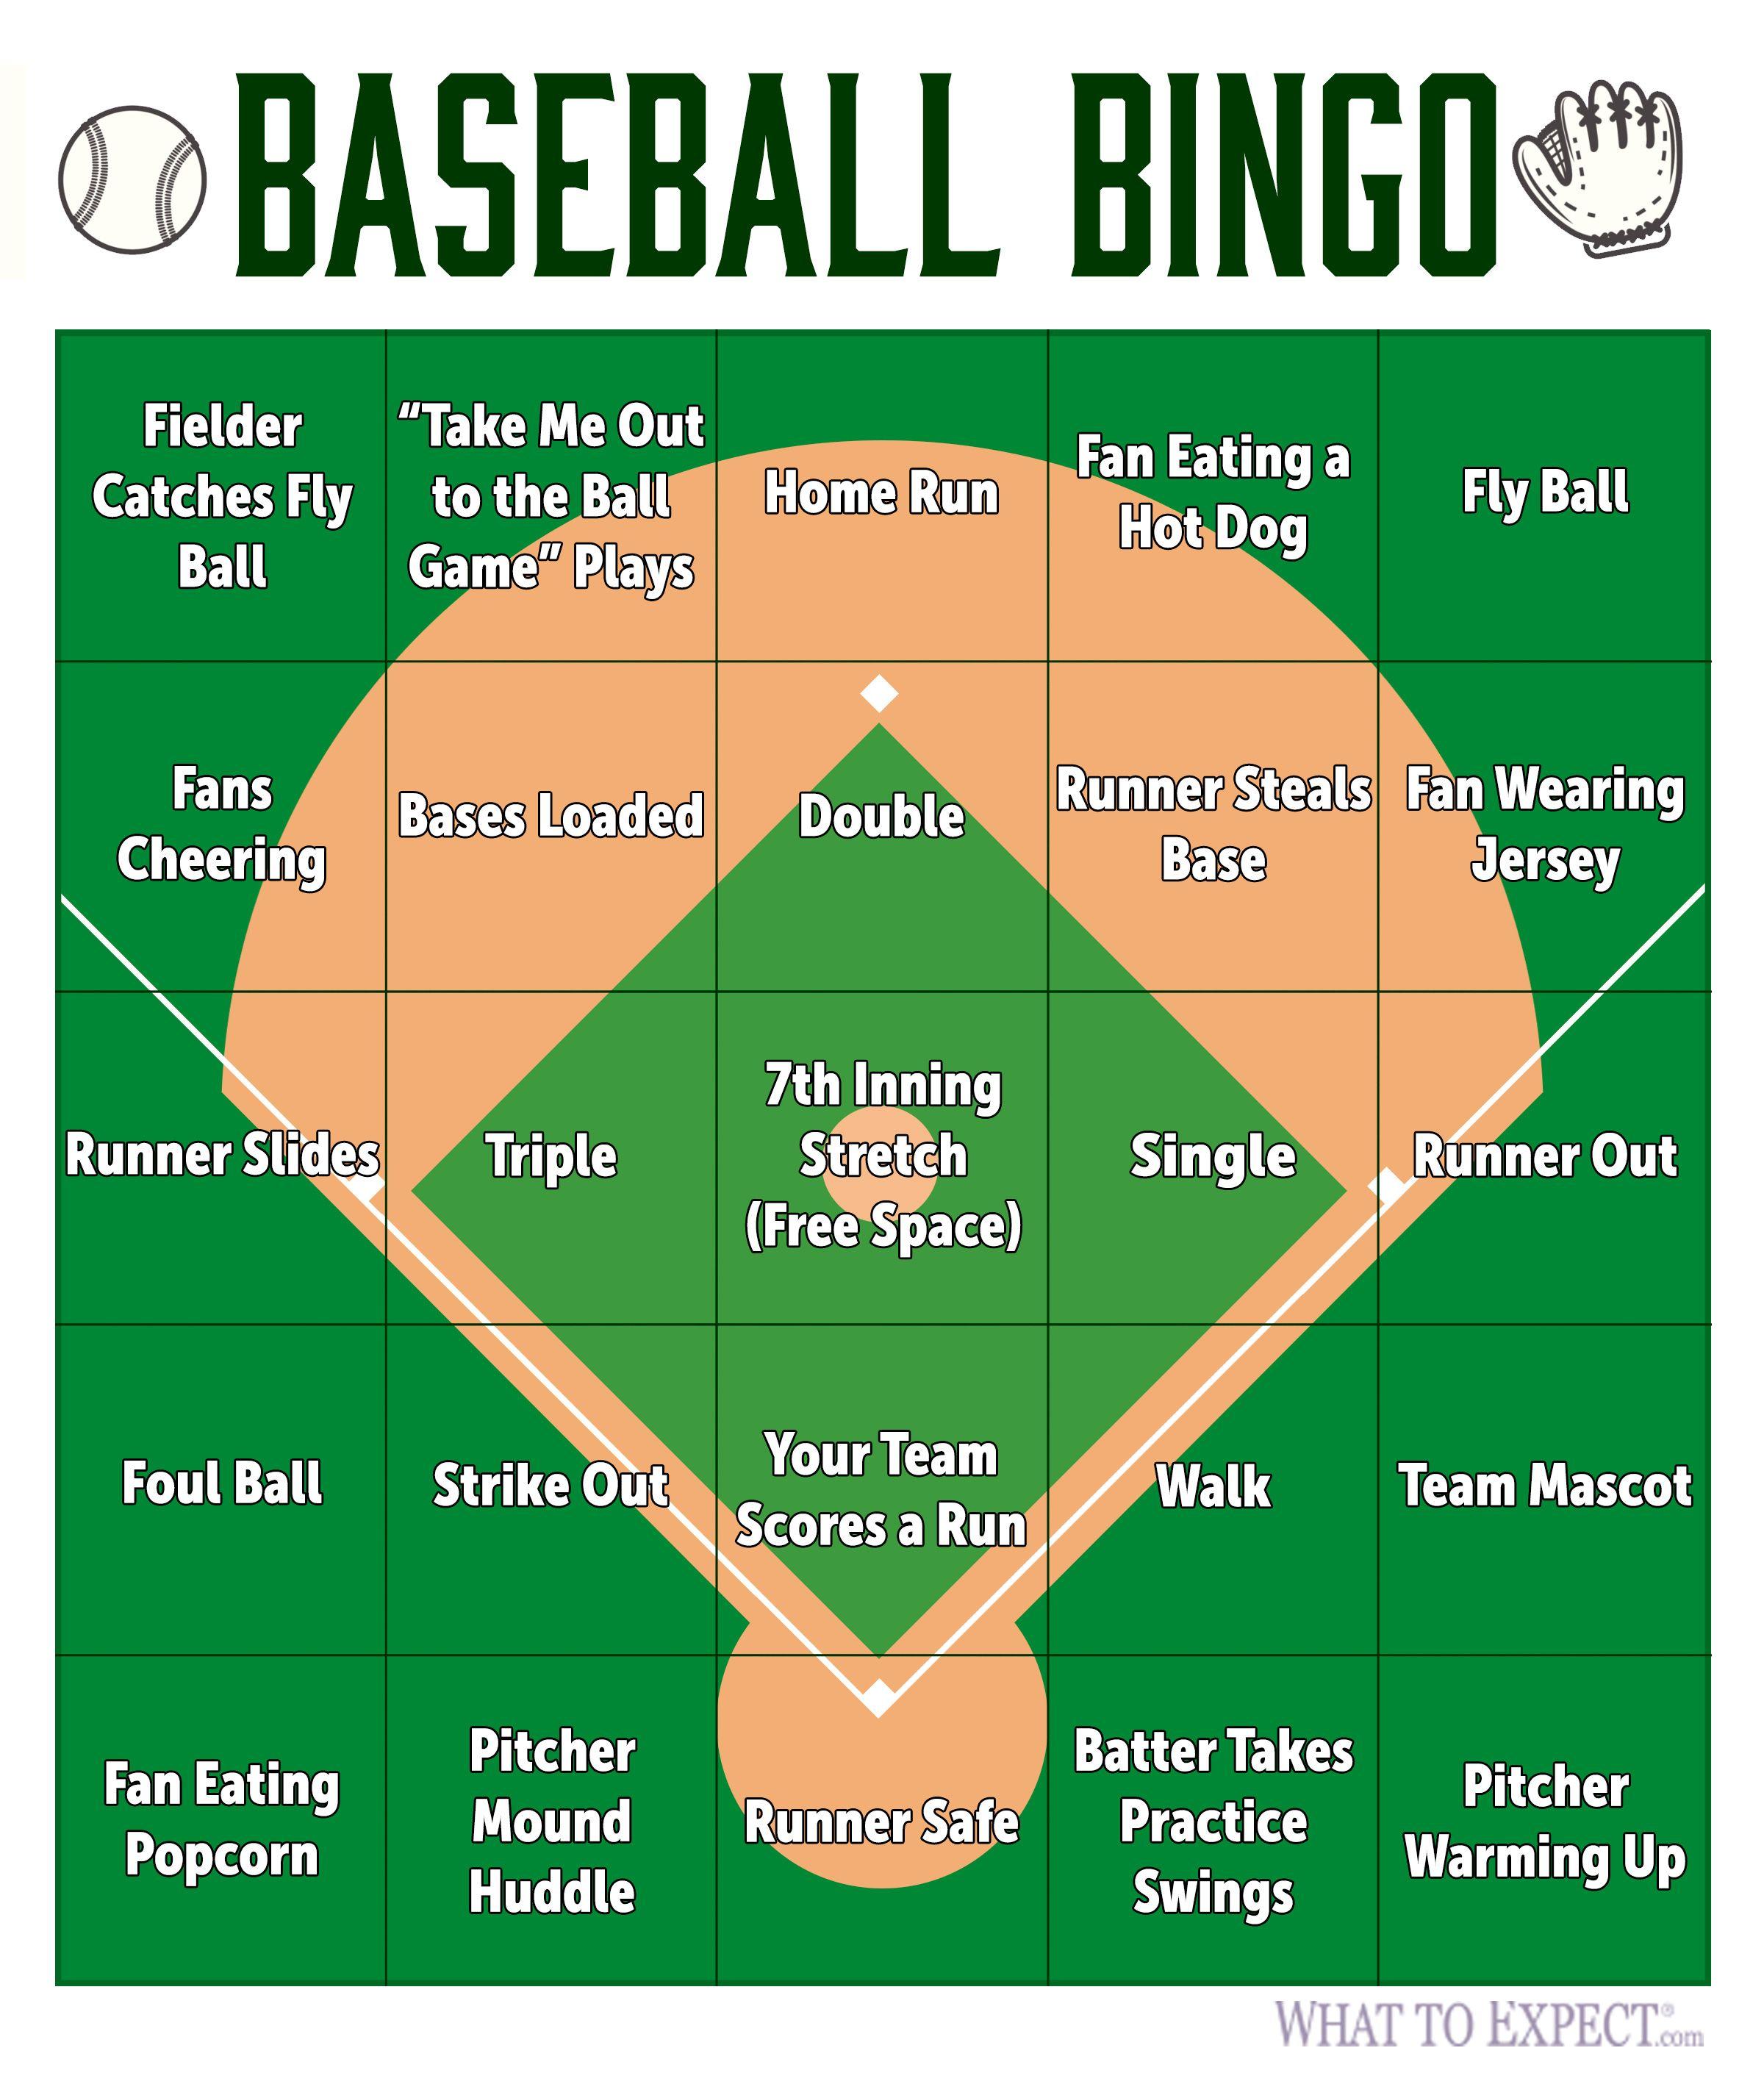 Imagesoramedia Wte3 0 Gcms Baseball Bingo Full